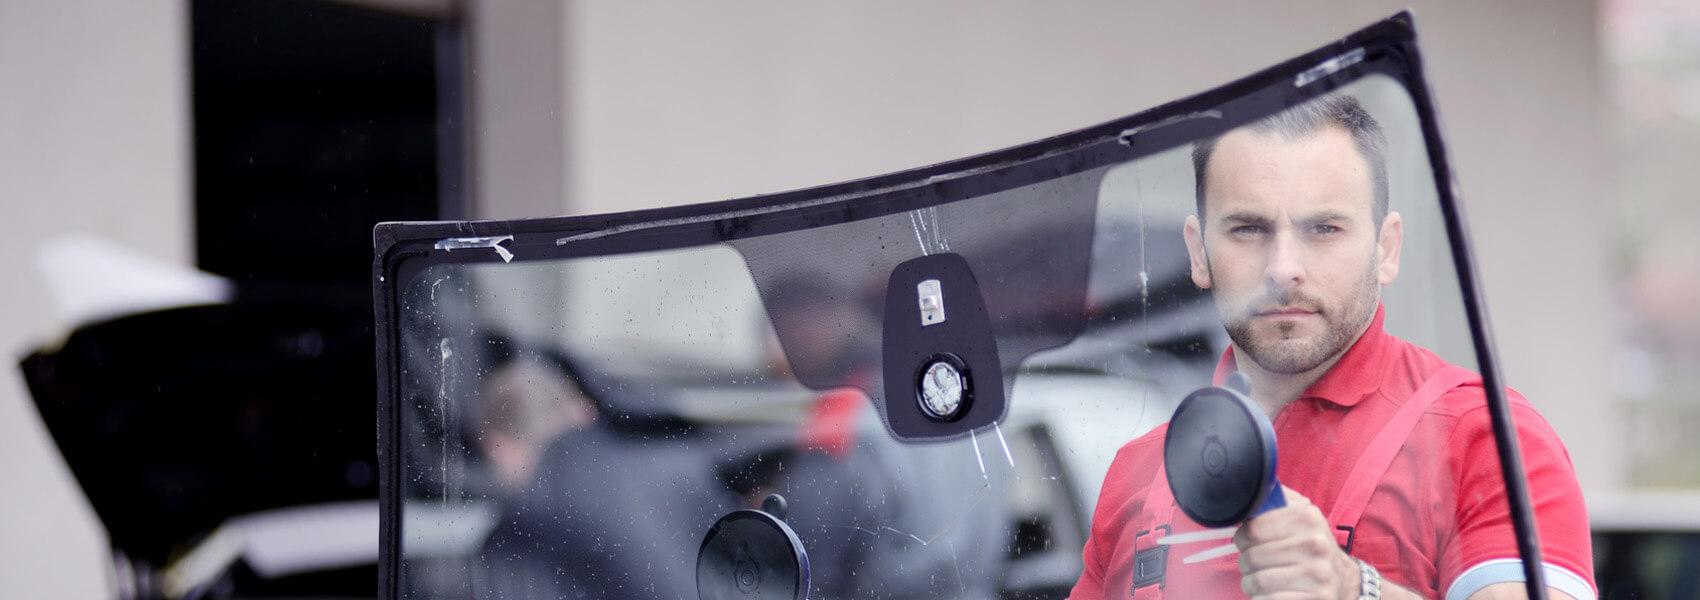 replacing windshield